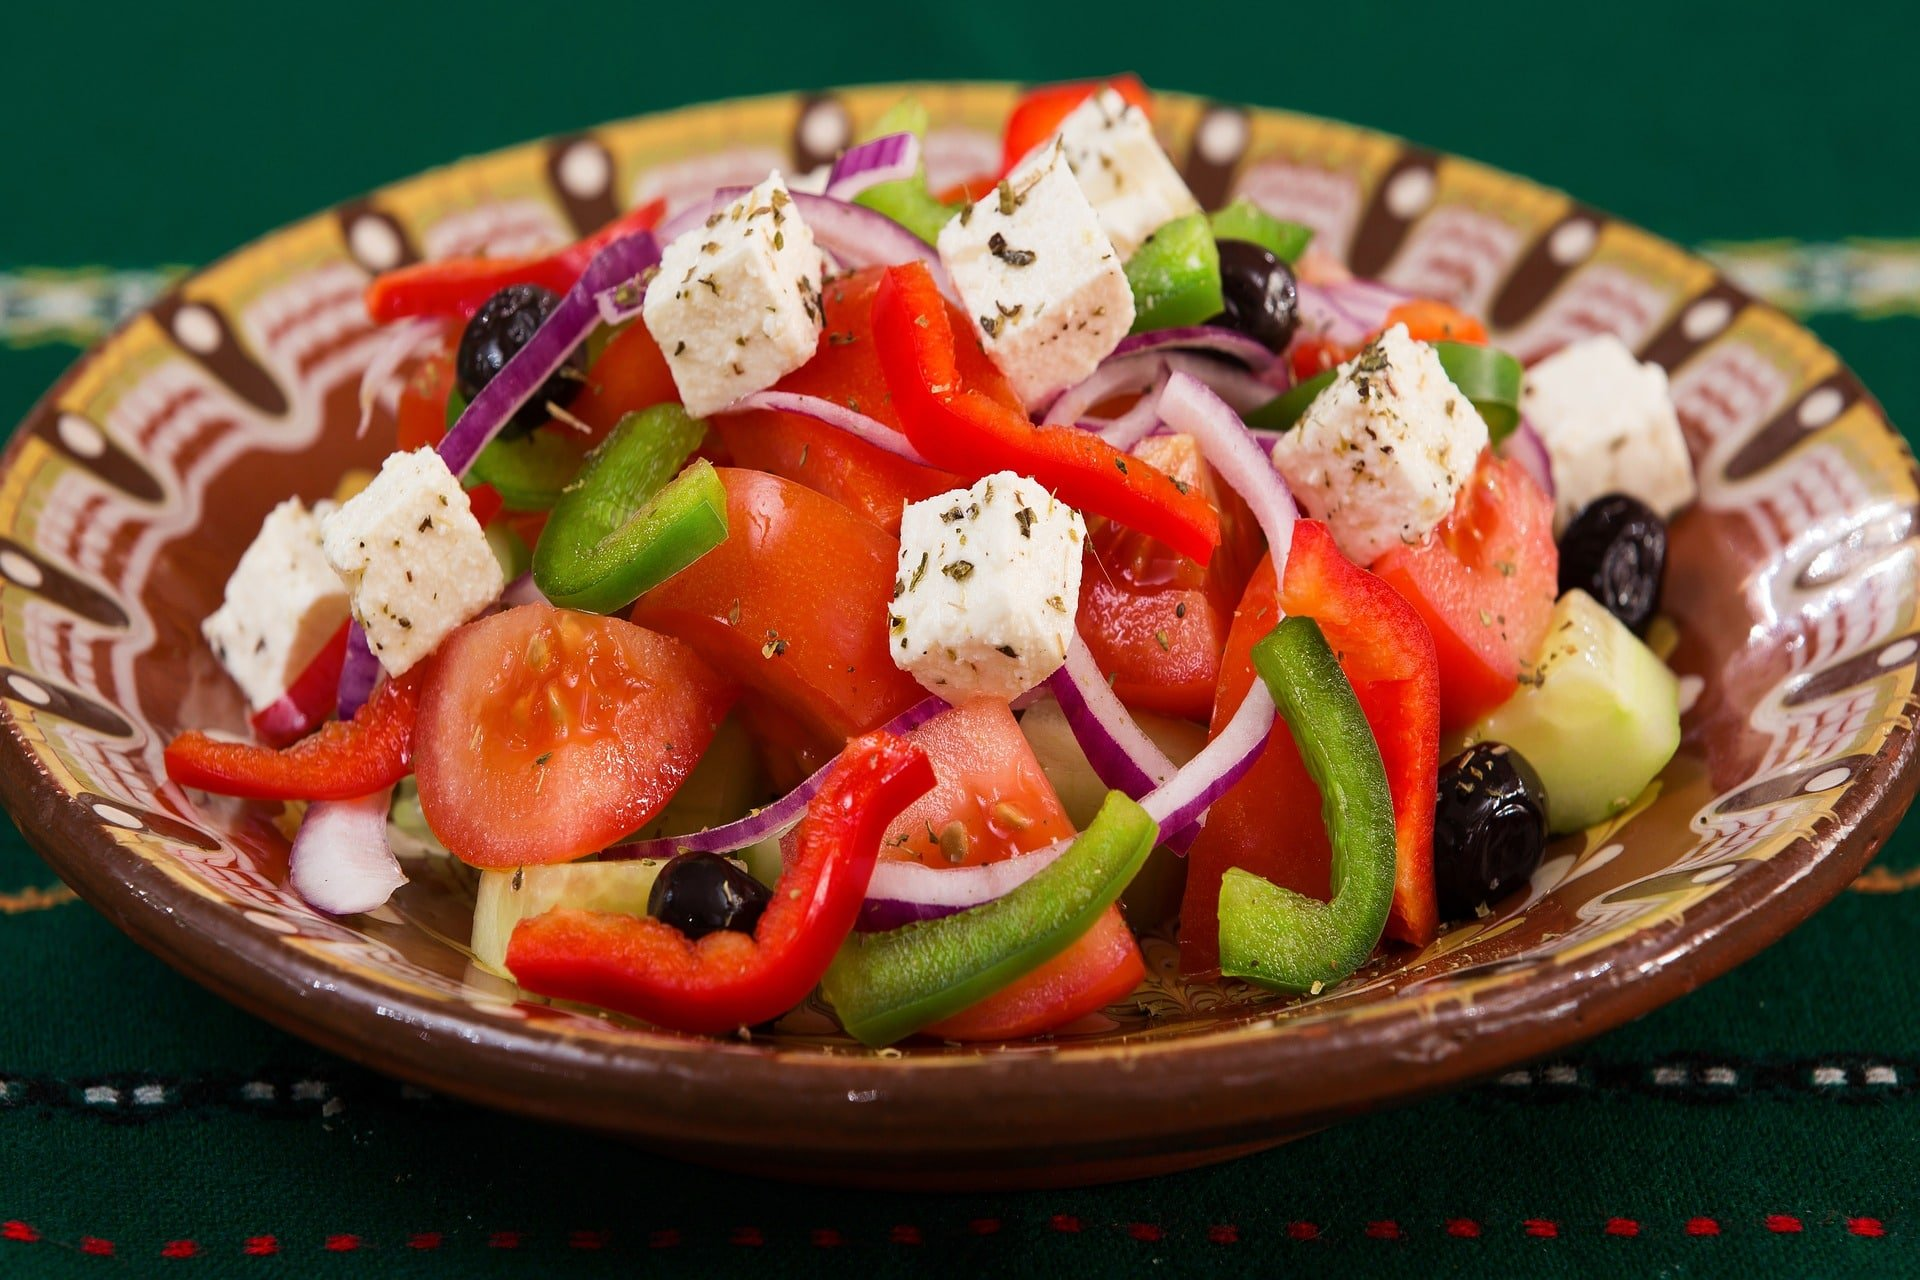 Mediterranean Diet vs Keto - differences